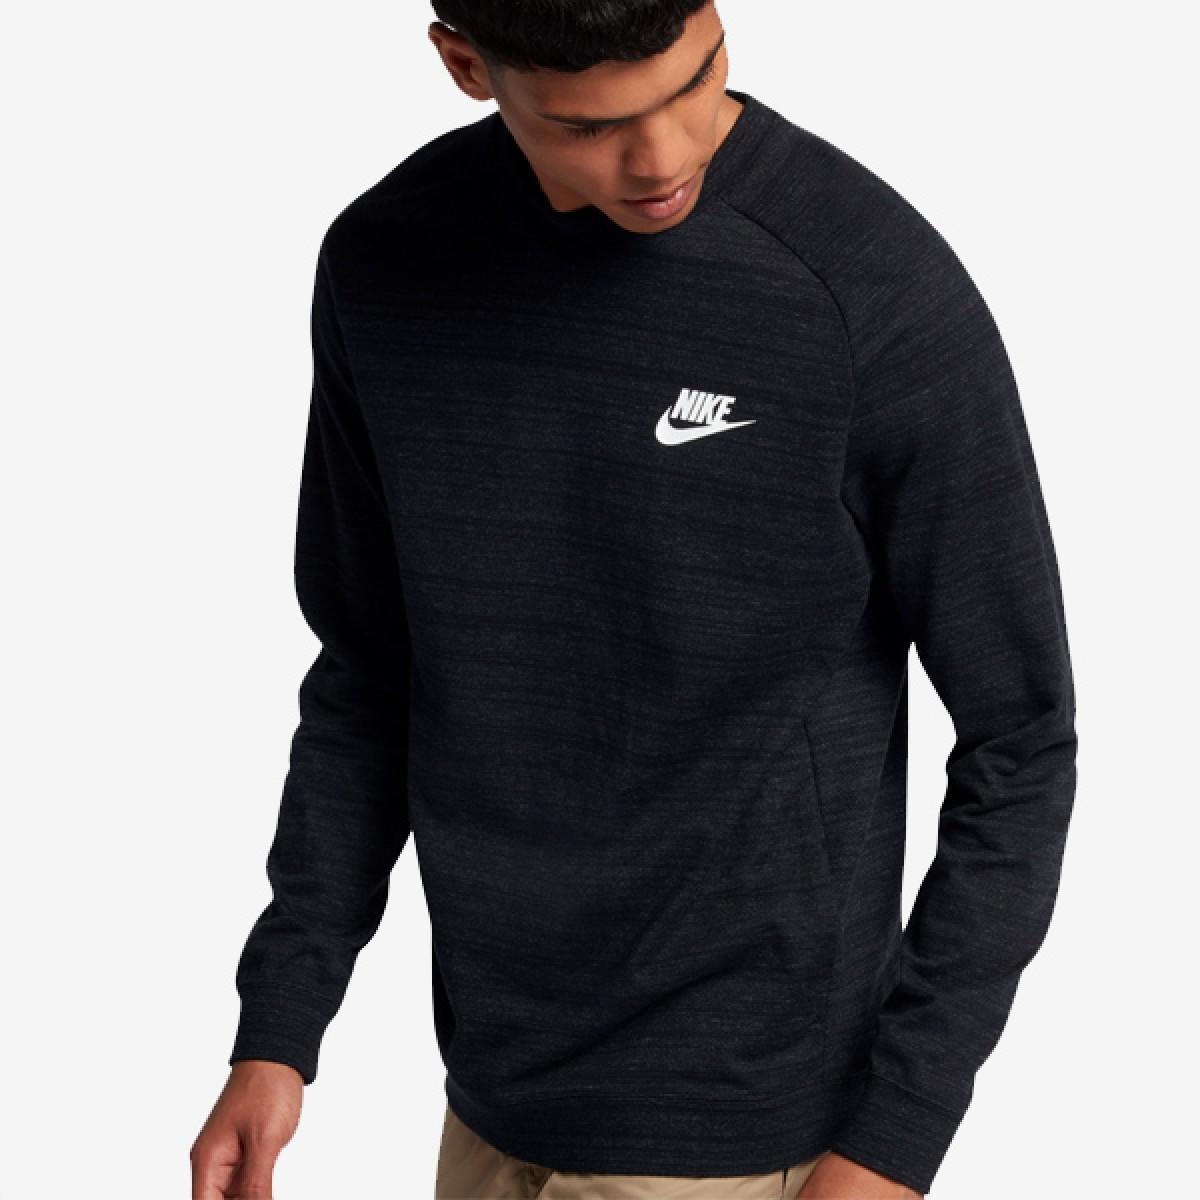 Nike Sportswear Advance 15 Crew 'Black'